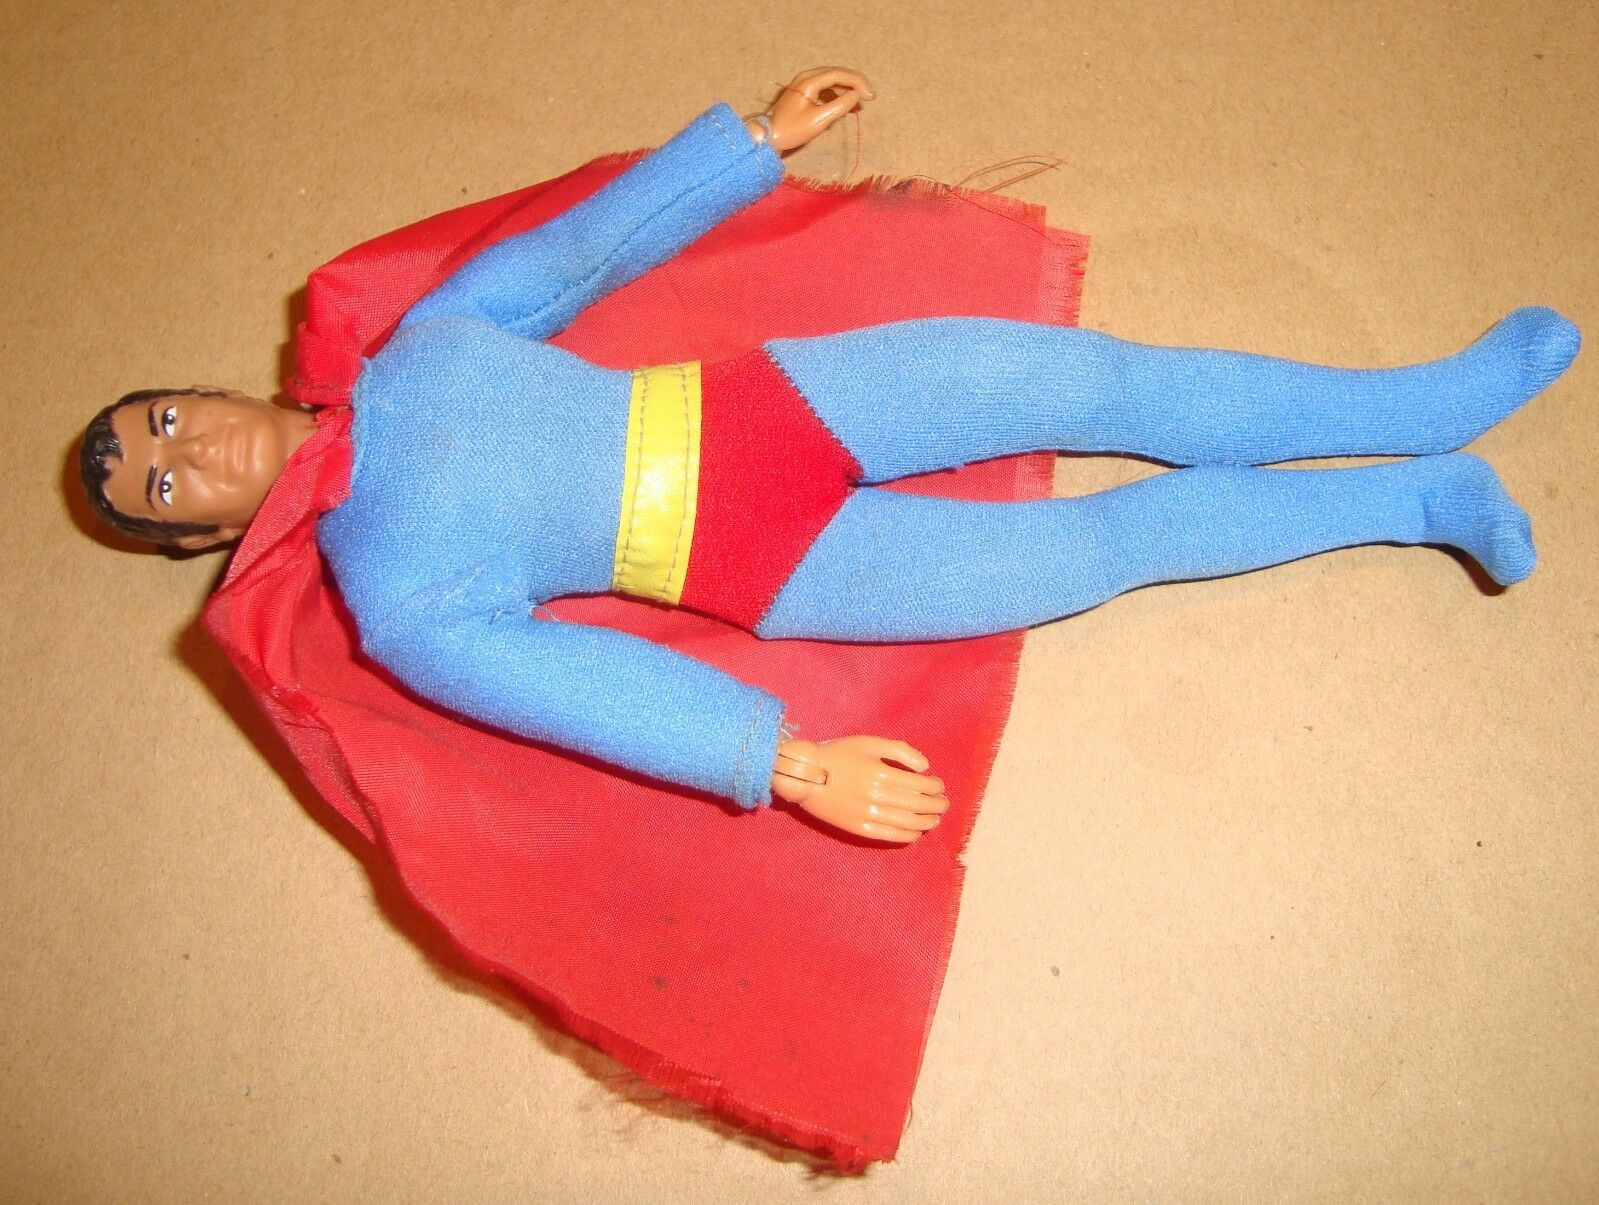 MEGO WORLD'S GREATEST SUPER-HEROES SUPERMAN MEGO CORP. 1974